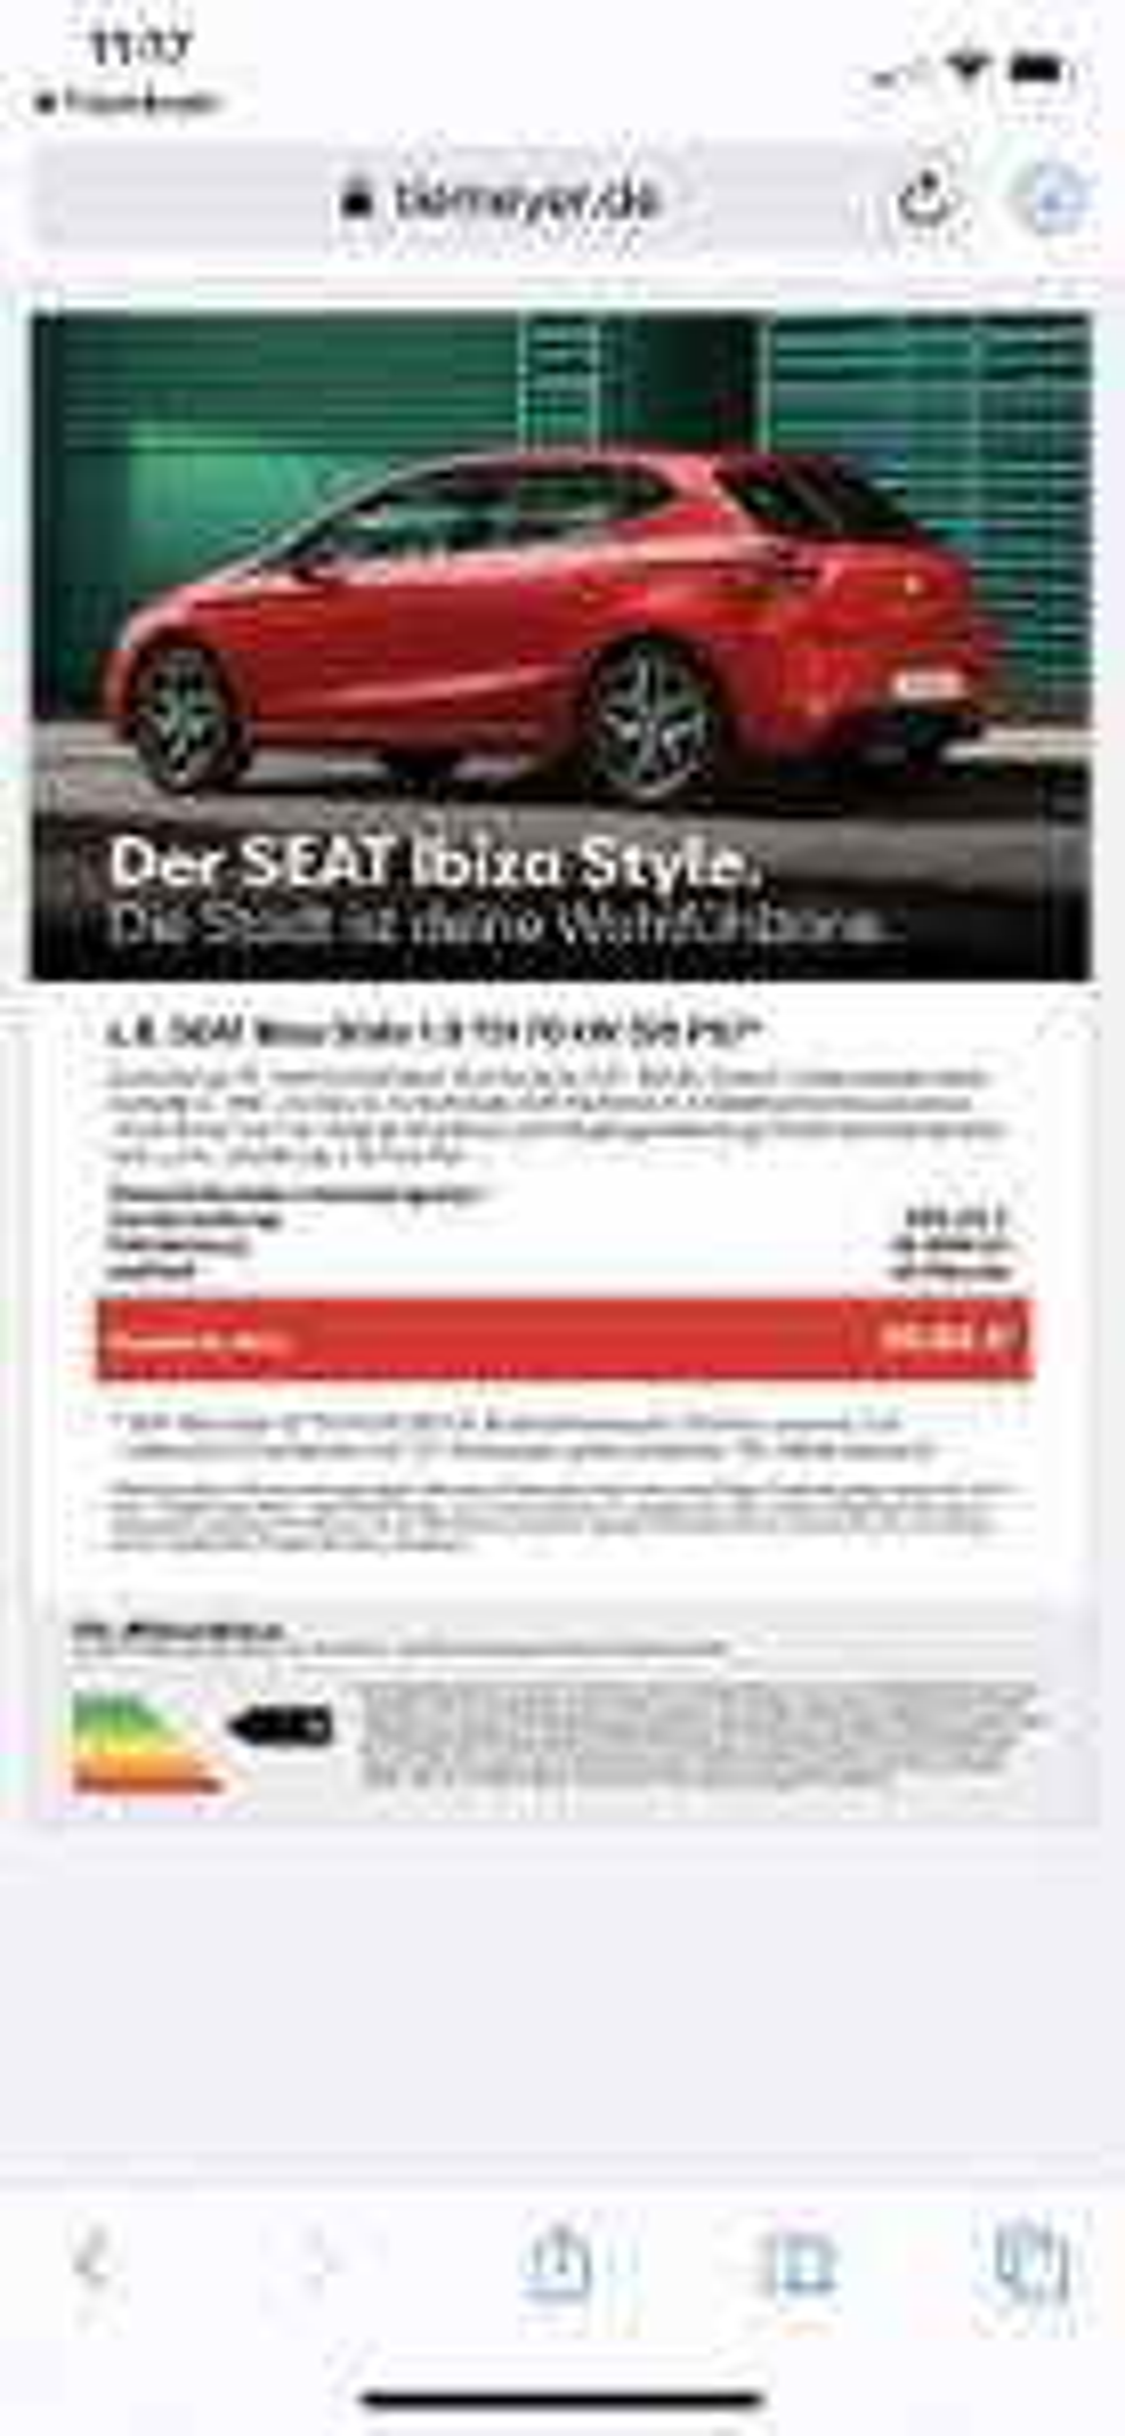 SEAT Ibiza Style 39€ monatlich netto Leasing (Gewerbeleasing)